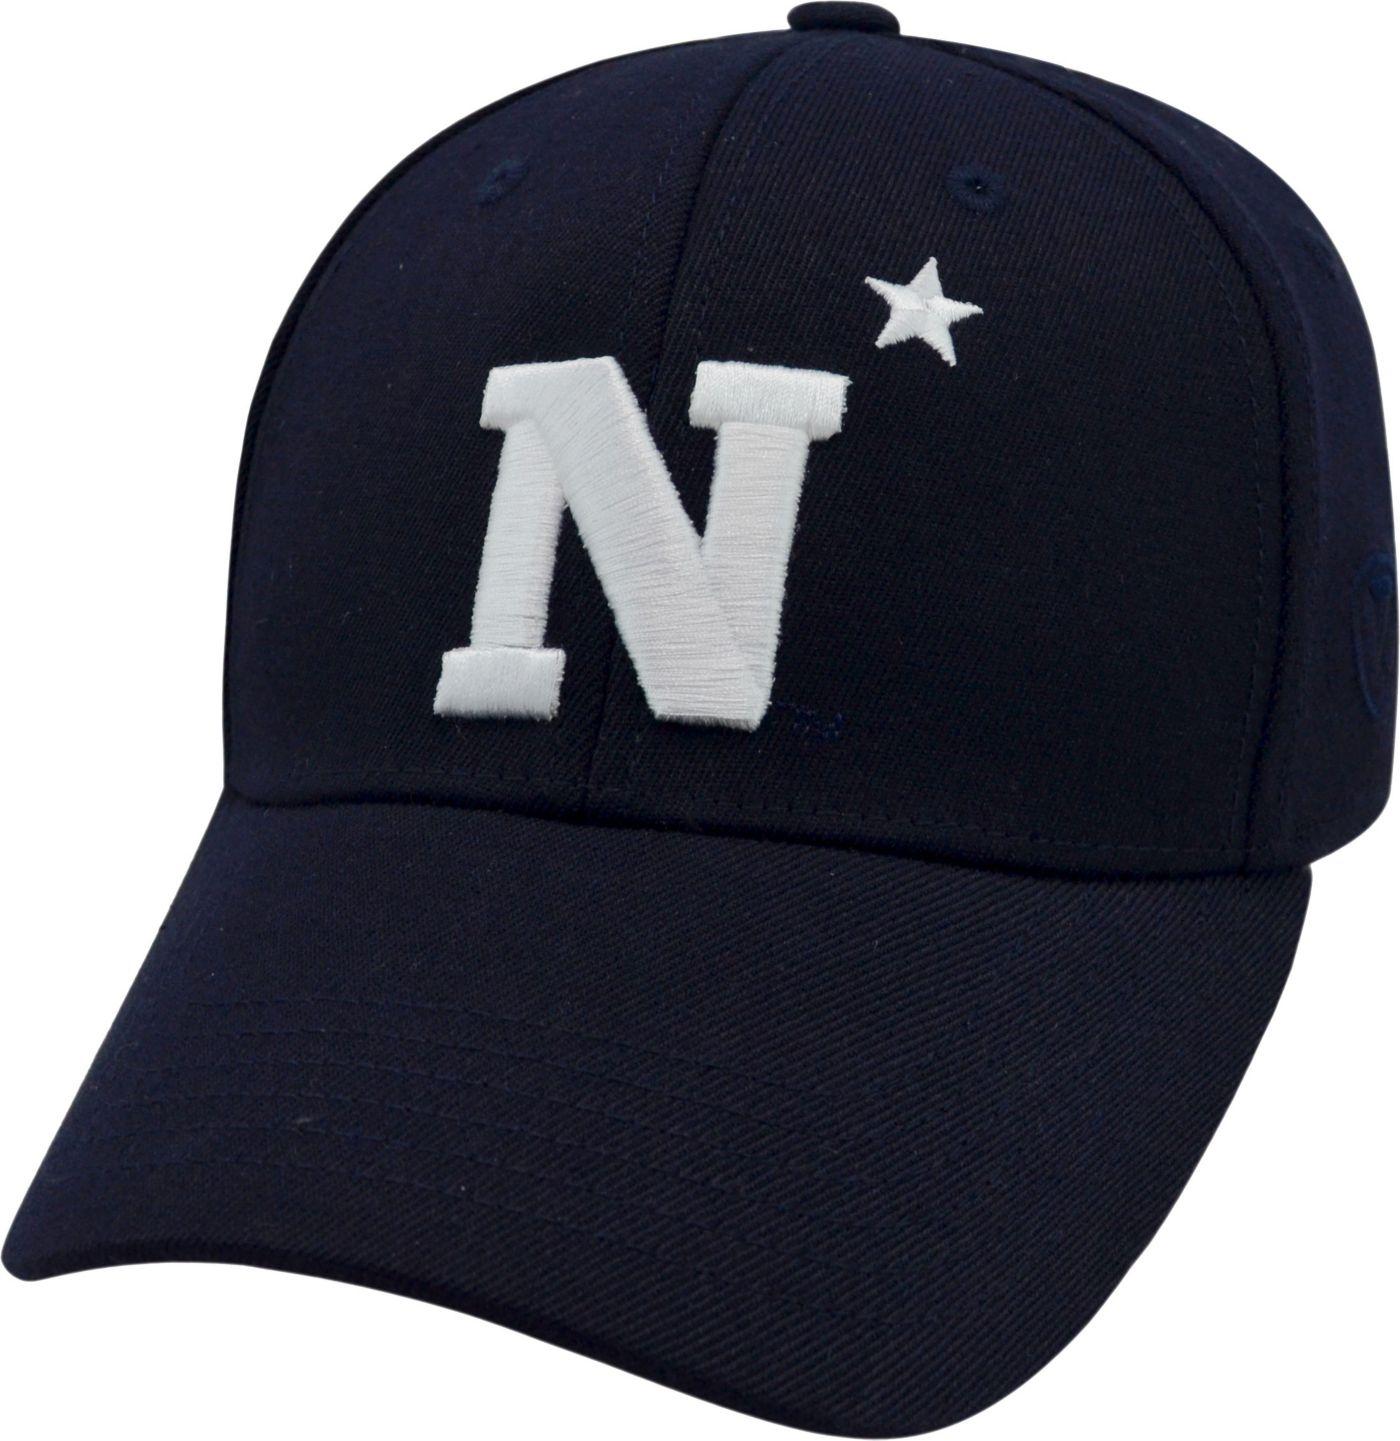 Top of the World Men's Navy Midshipmen Navy Premium Collection M-Fit Hat